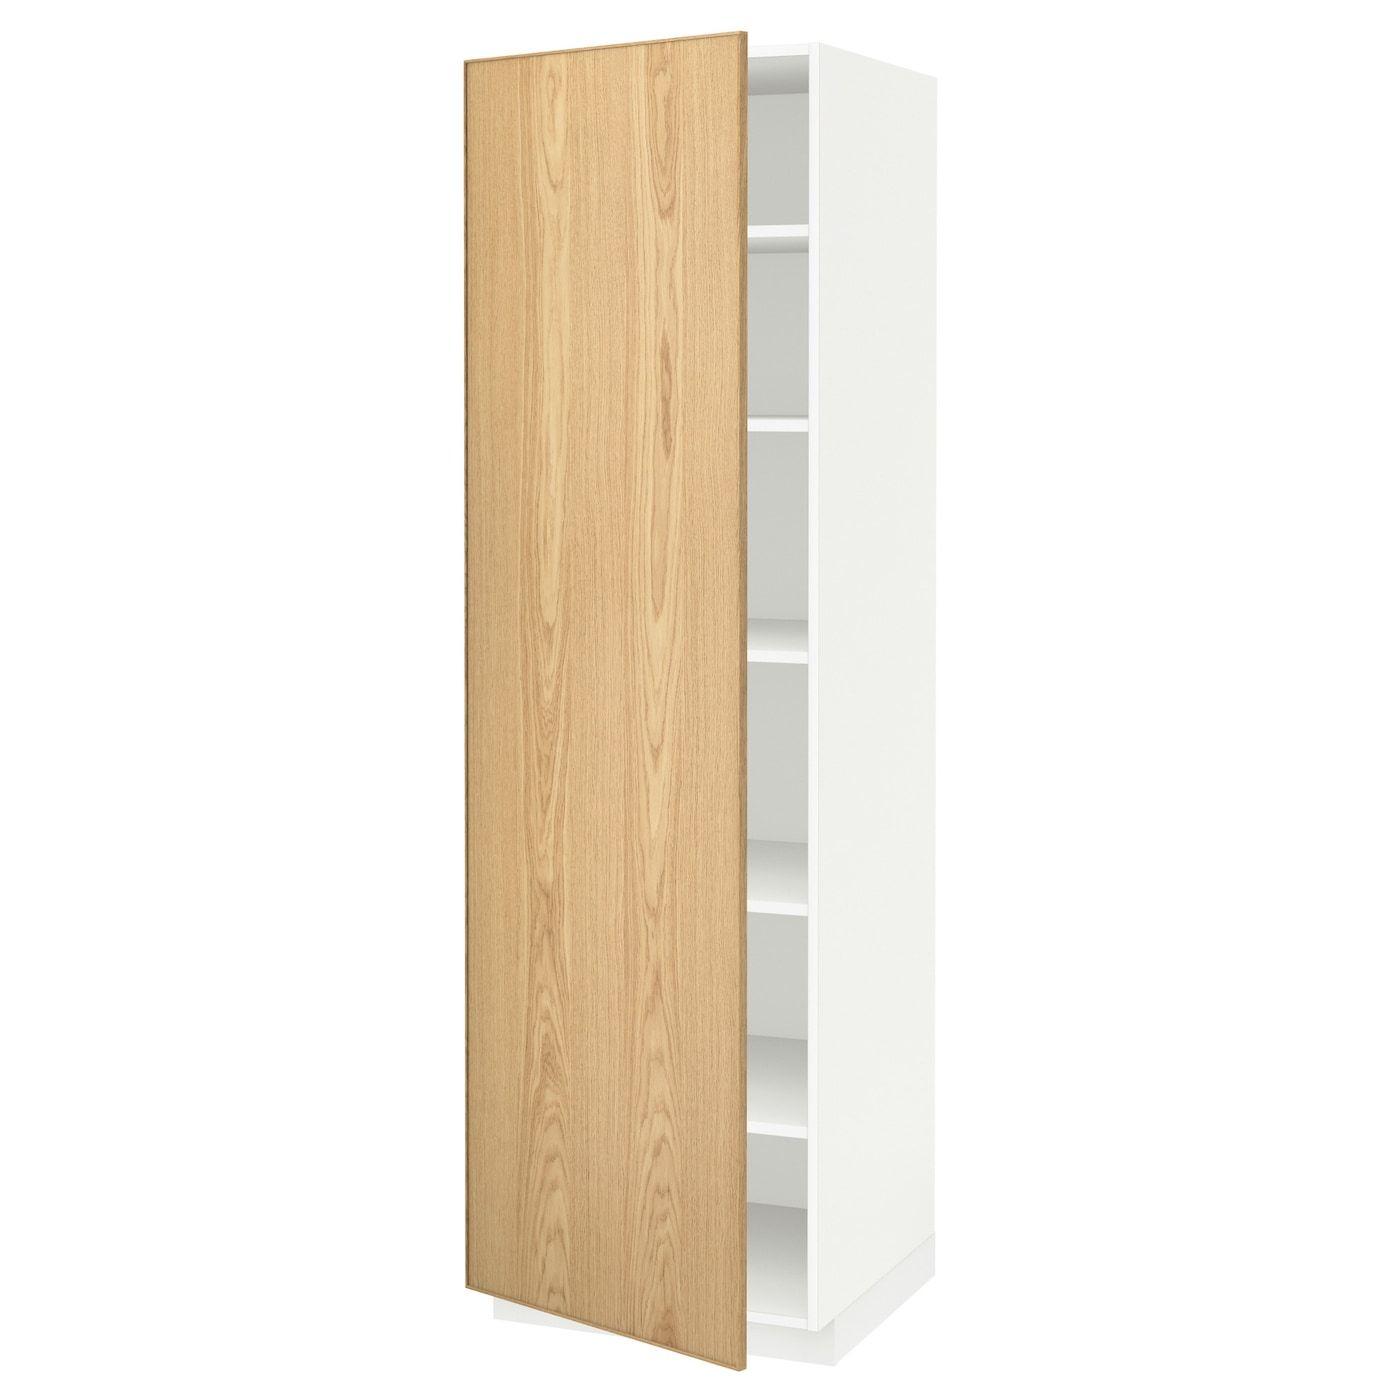 Metod High Cabinet With Shelves White Ekestad Oak 60x60x200 Cm